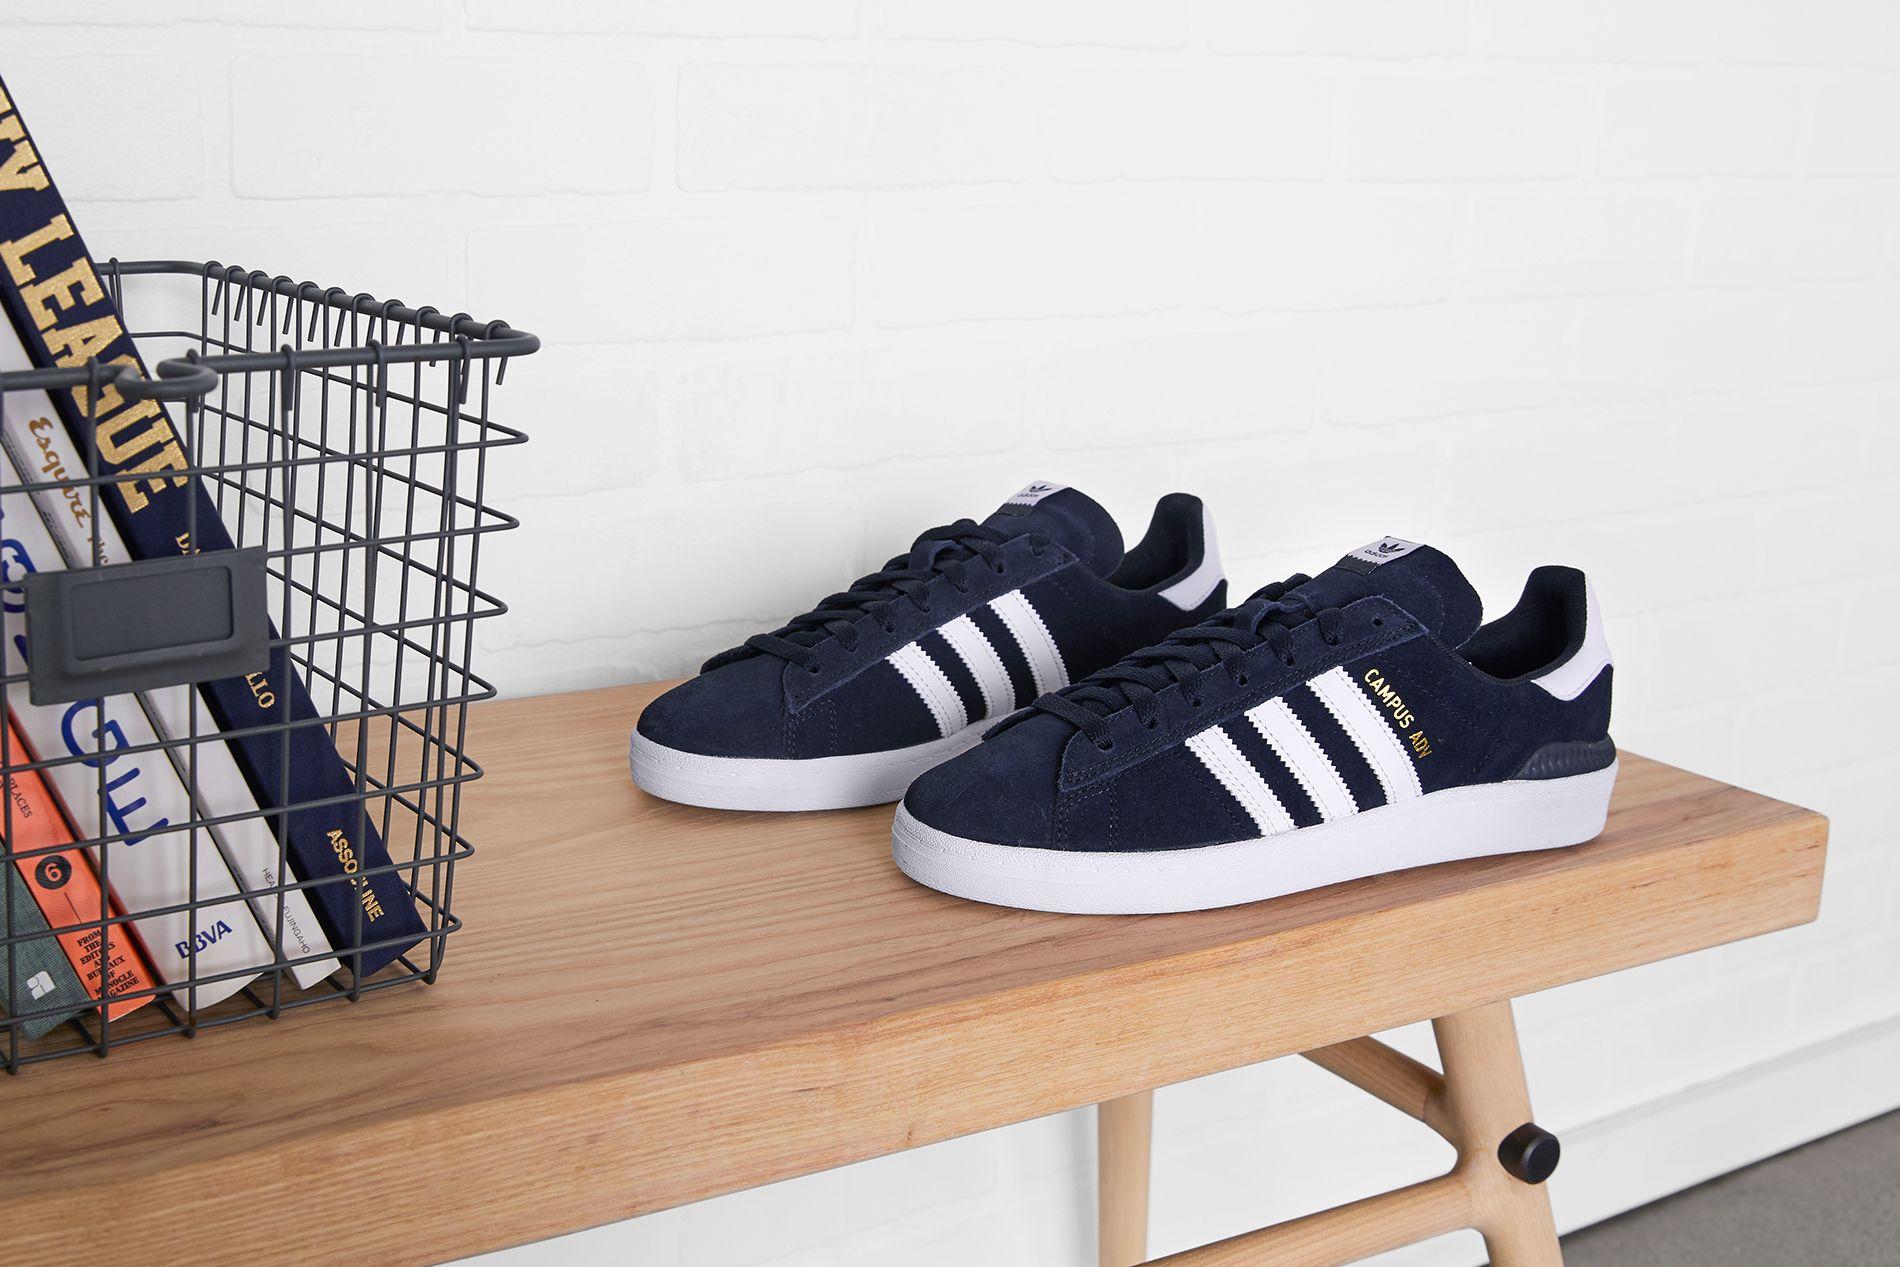 The Adidas Campus ADV Is a Modern Riff